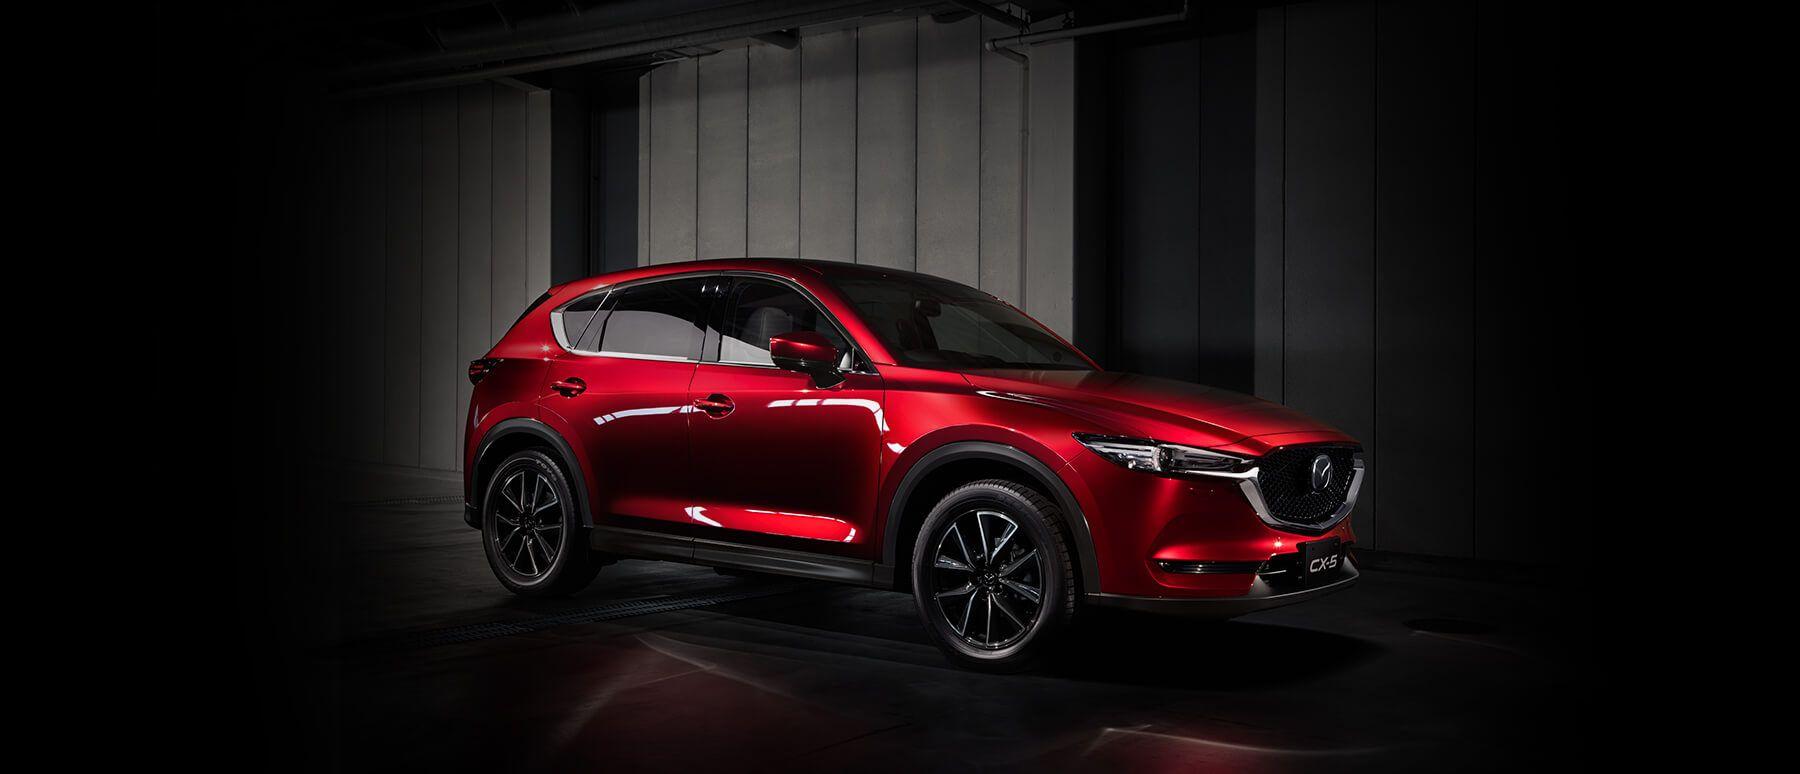 The New 2017 Mazda CX 5 Crossover SUV Fuel Efficient SUV